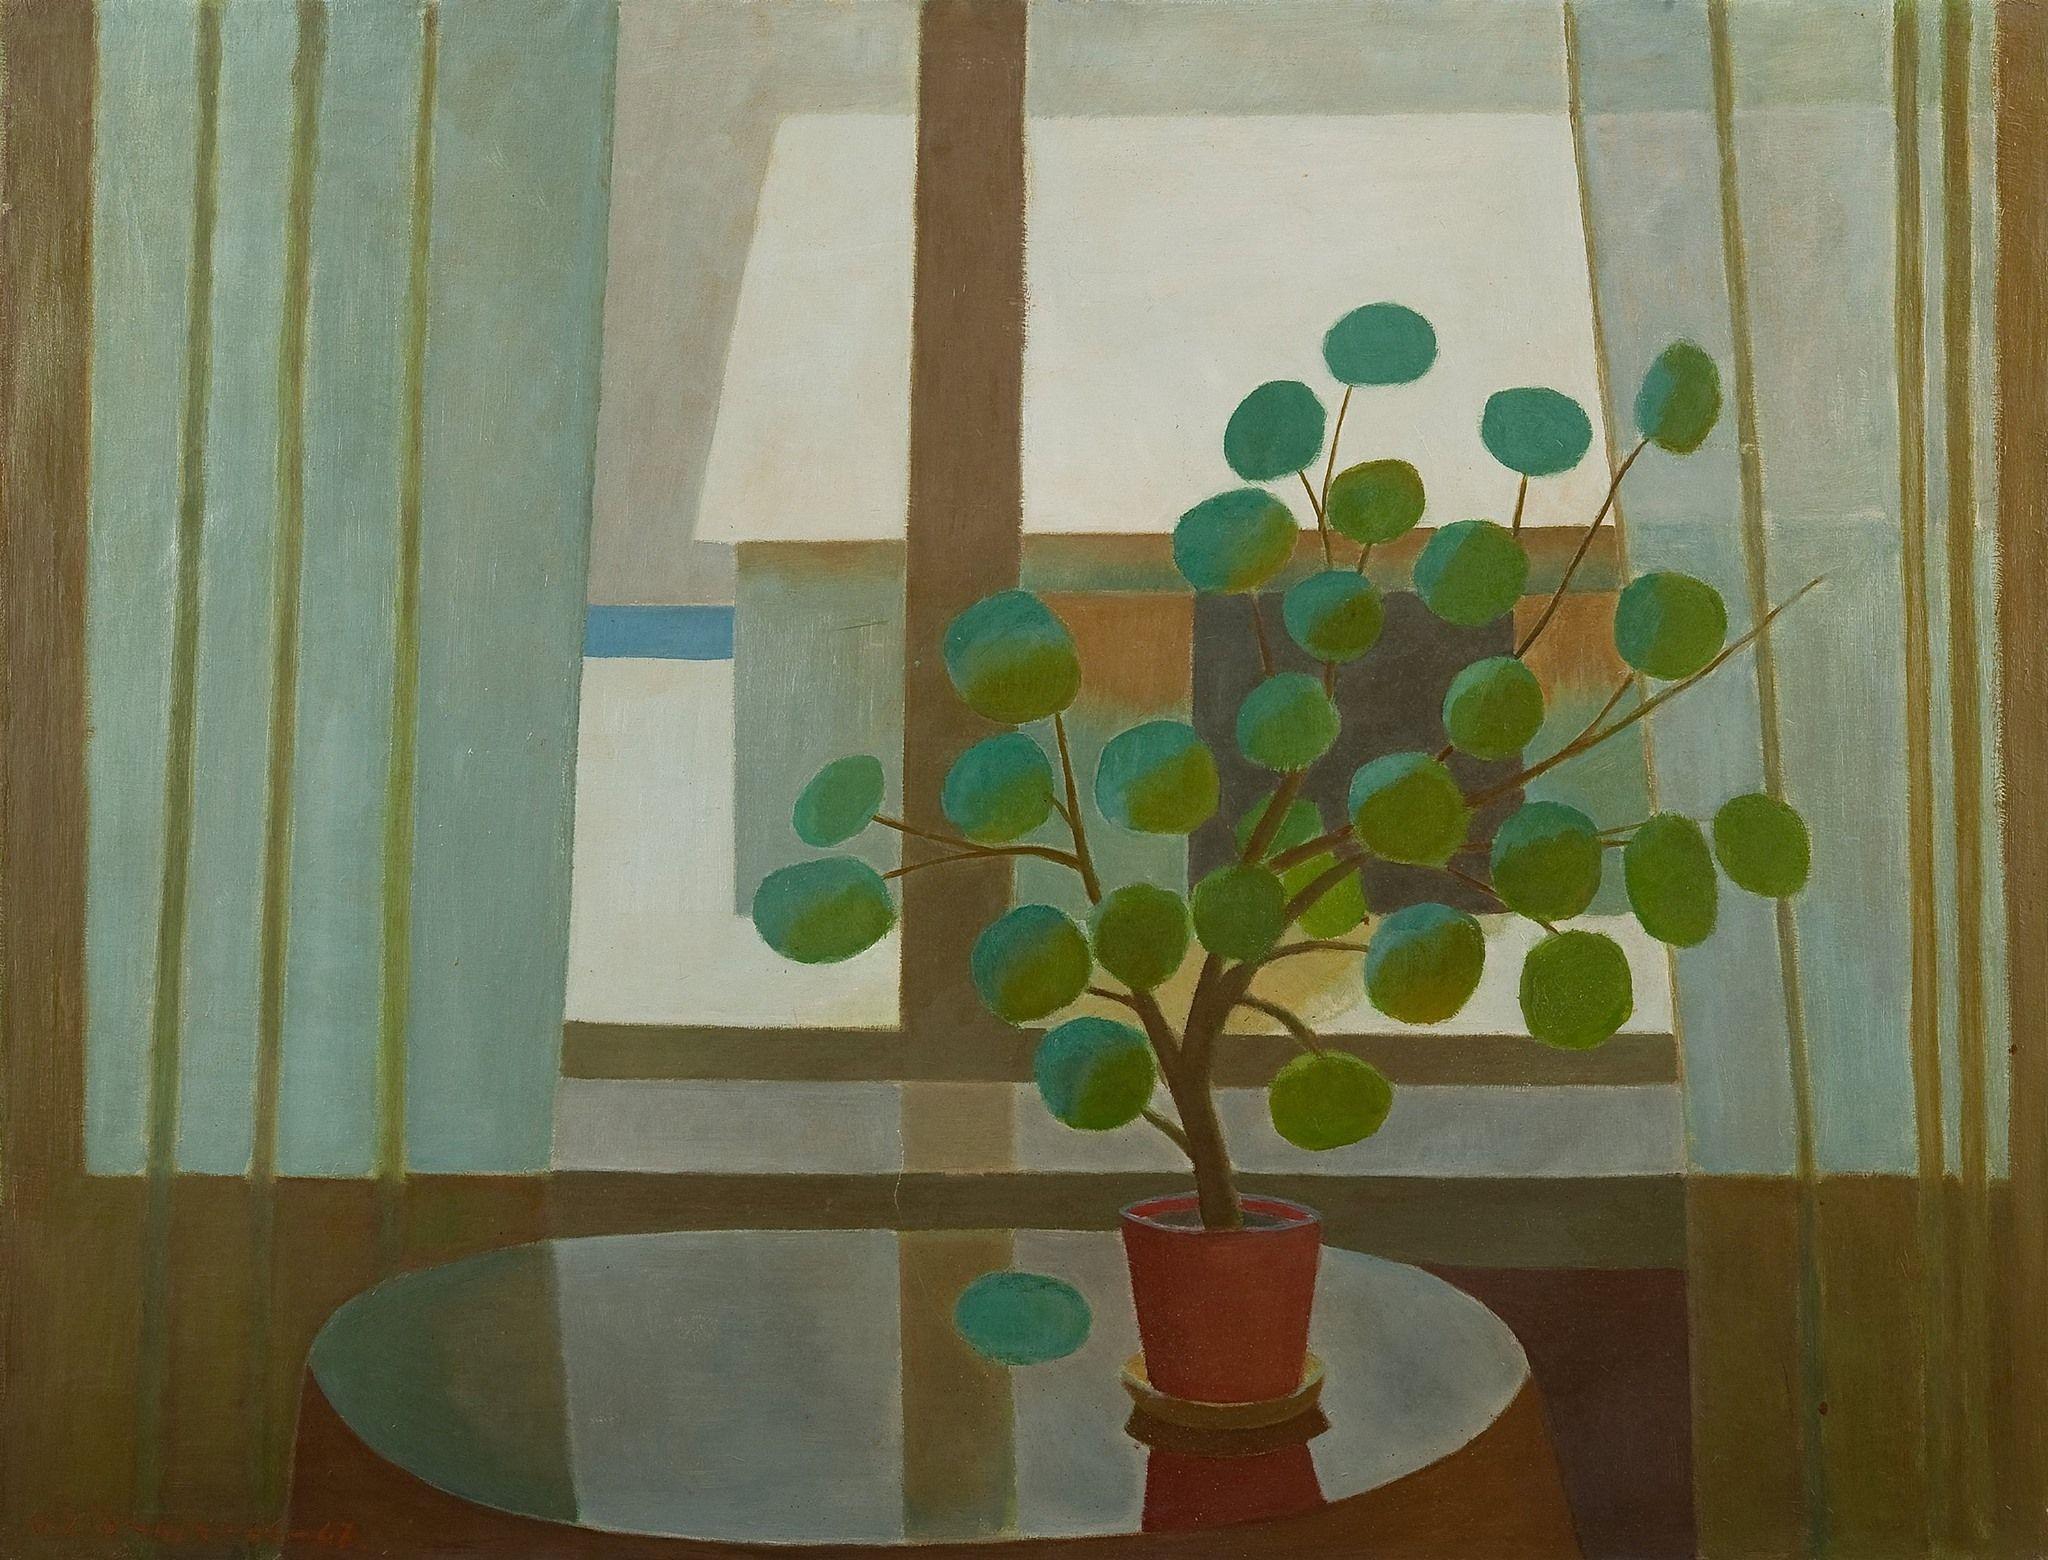 Veikko Vionoja, winter window, 1966.